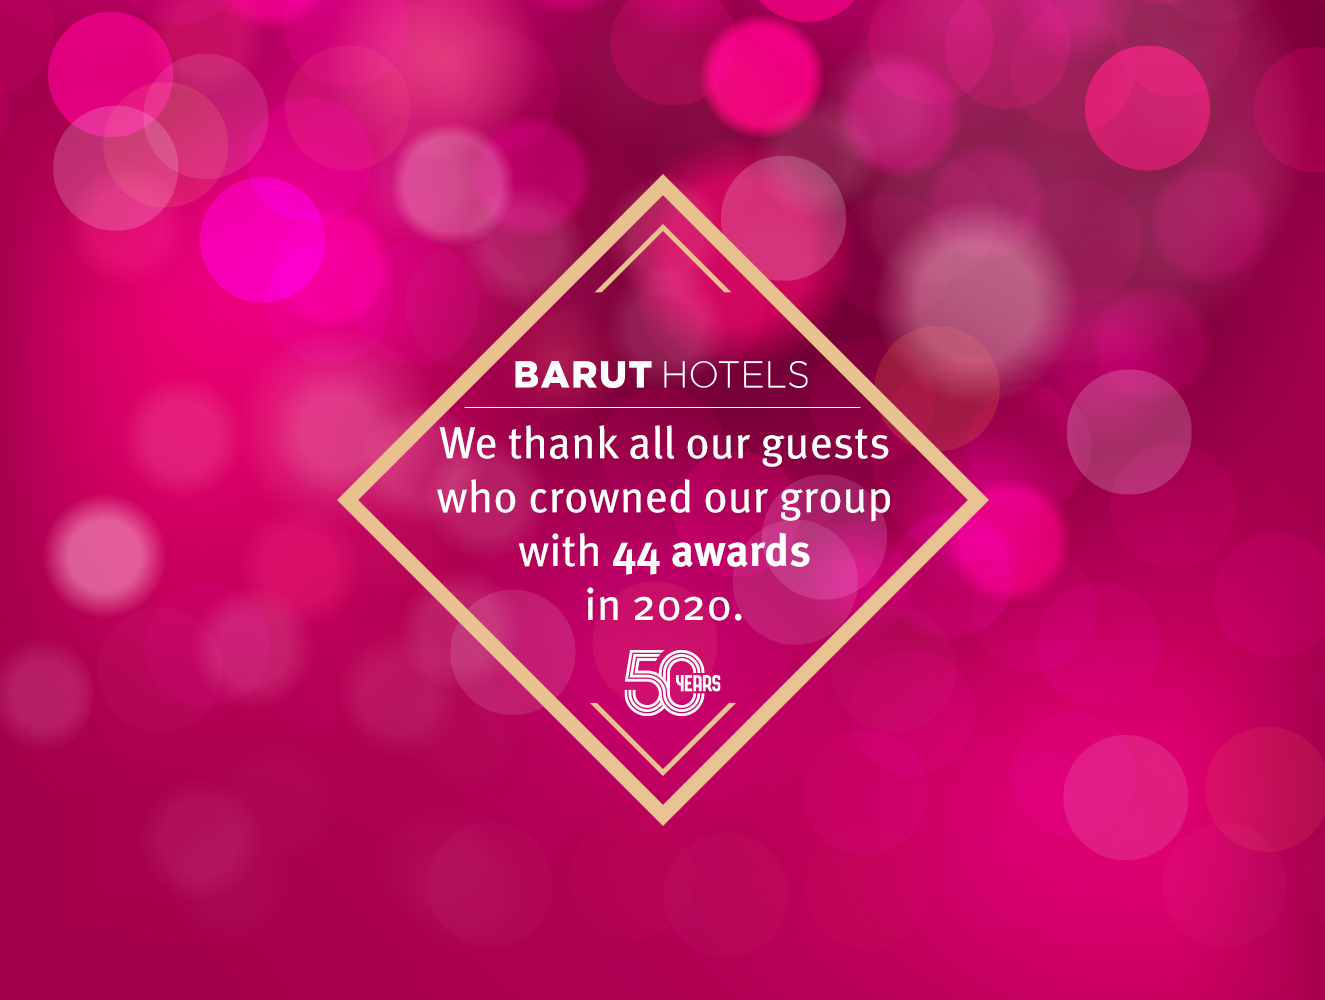 BARUT HOTELS 2020 AWARDS